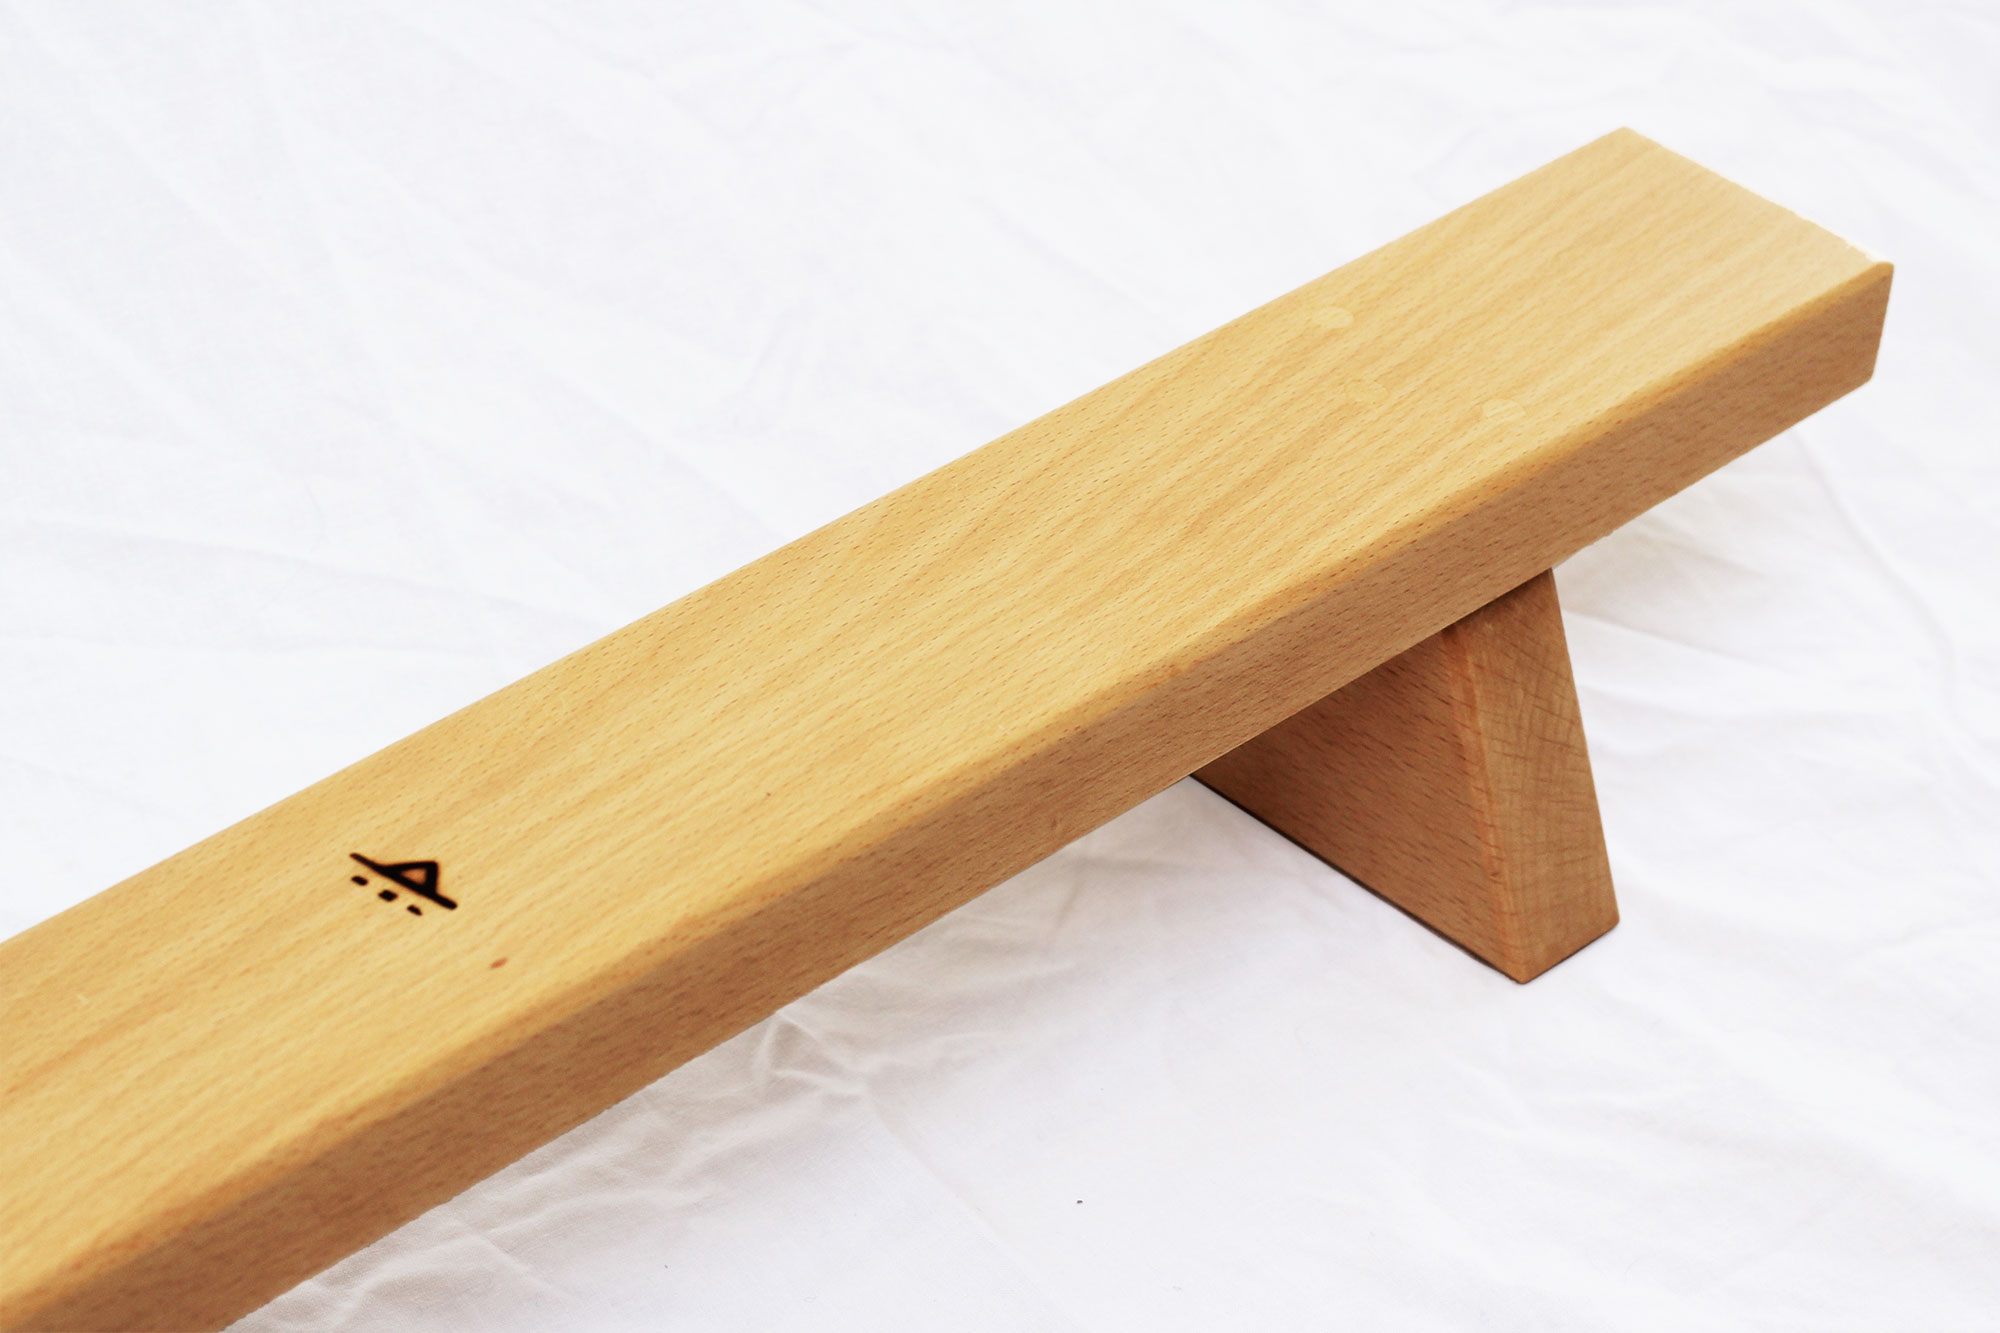 Push-up Boards Shena,Health /& Longevity,/Shena Push Up Board,/Zurkhaneh